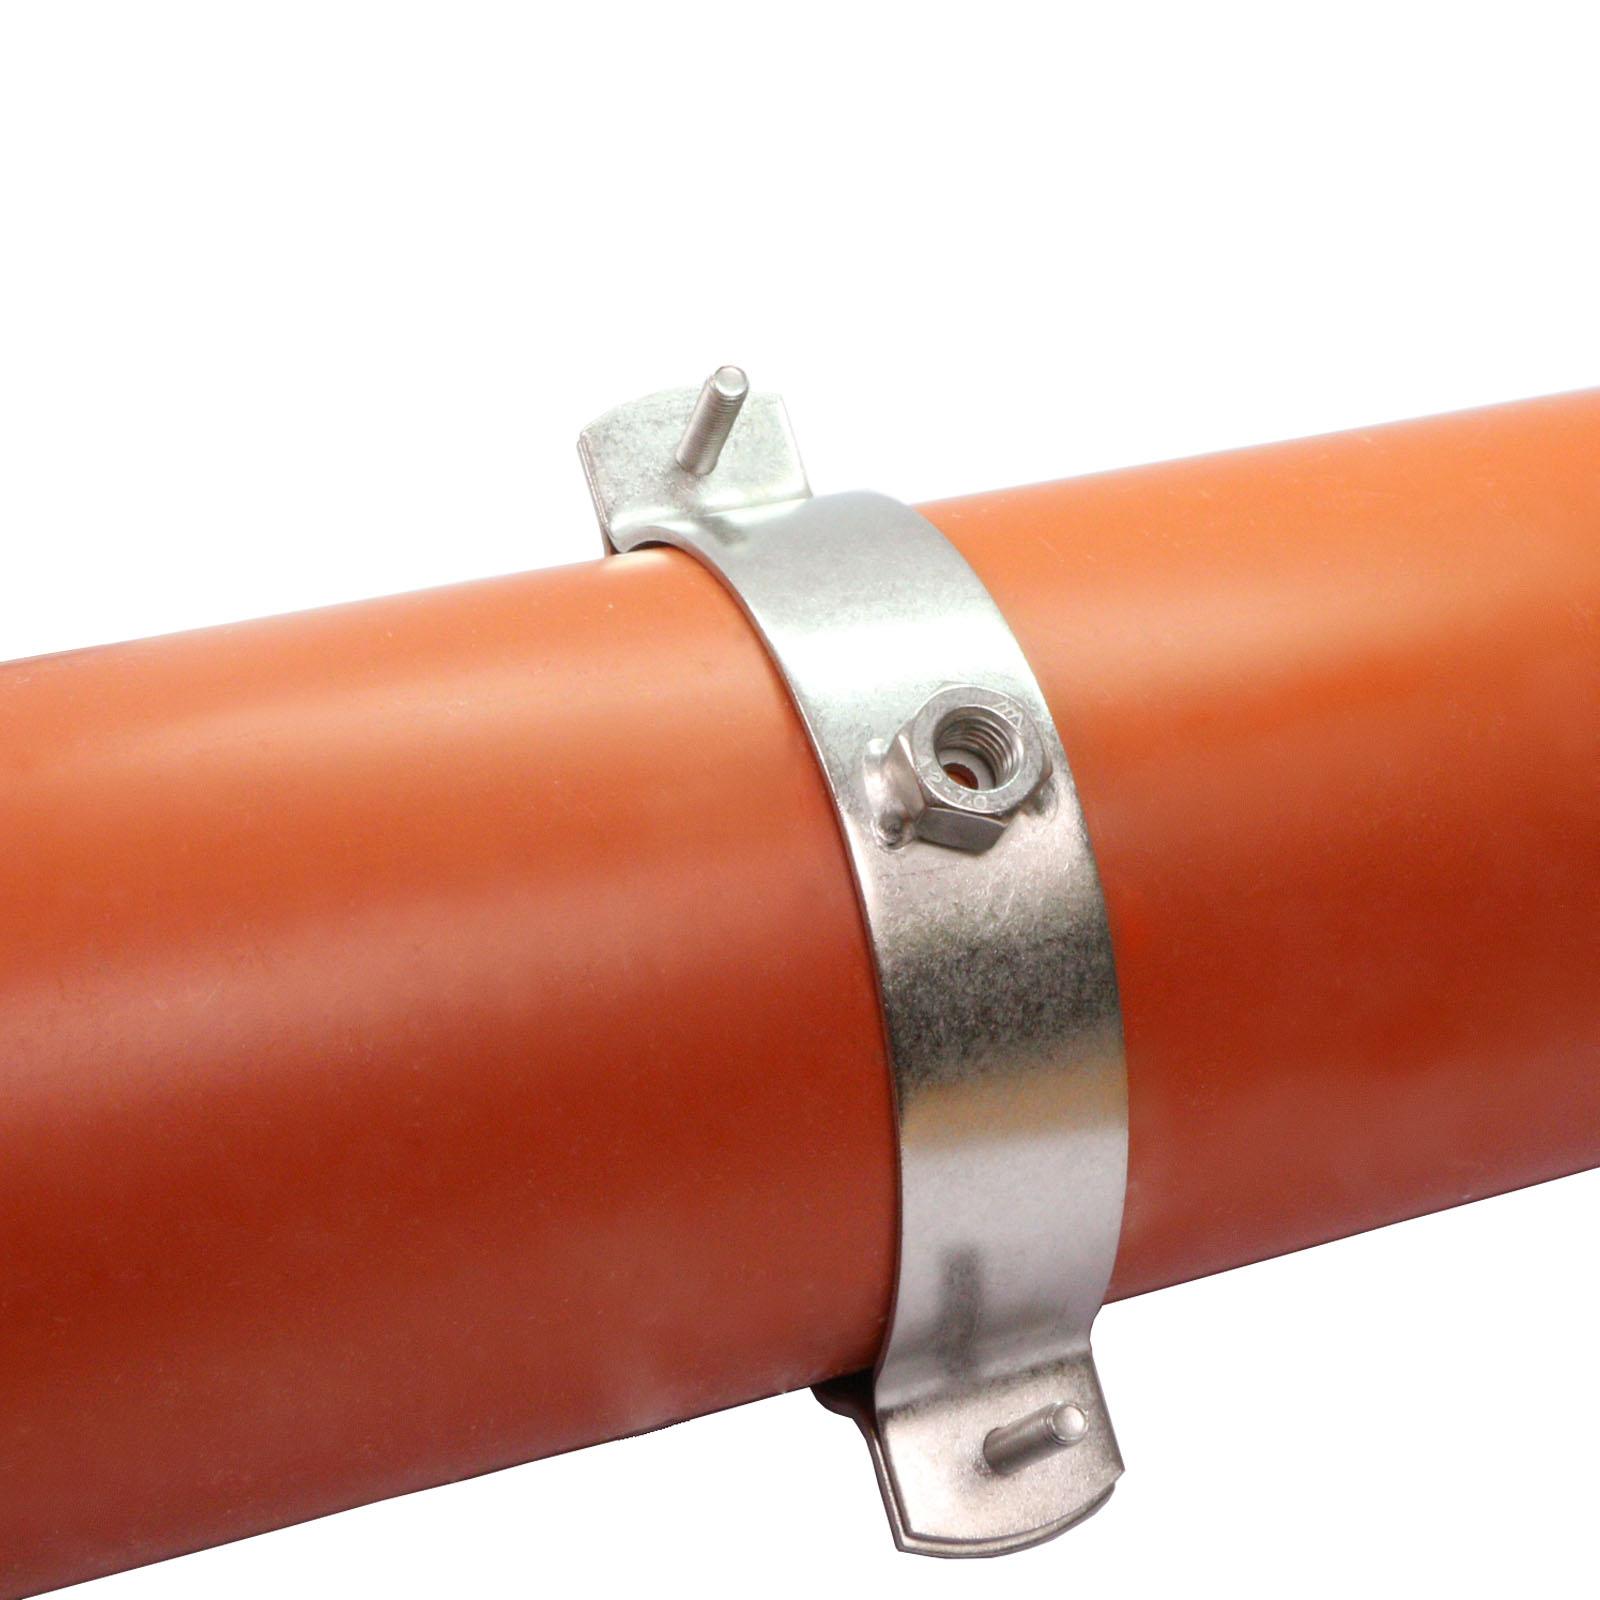 Edelstahl Rohrschellen V2A f 1 St/ück, 25-31mm, 3//4 Stockschrauben Rohrhalter Rohrbefestigung Rohr